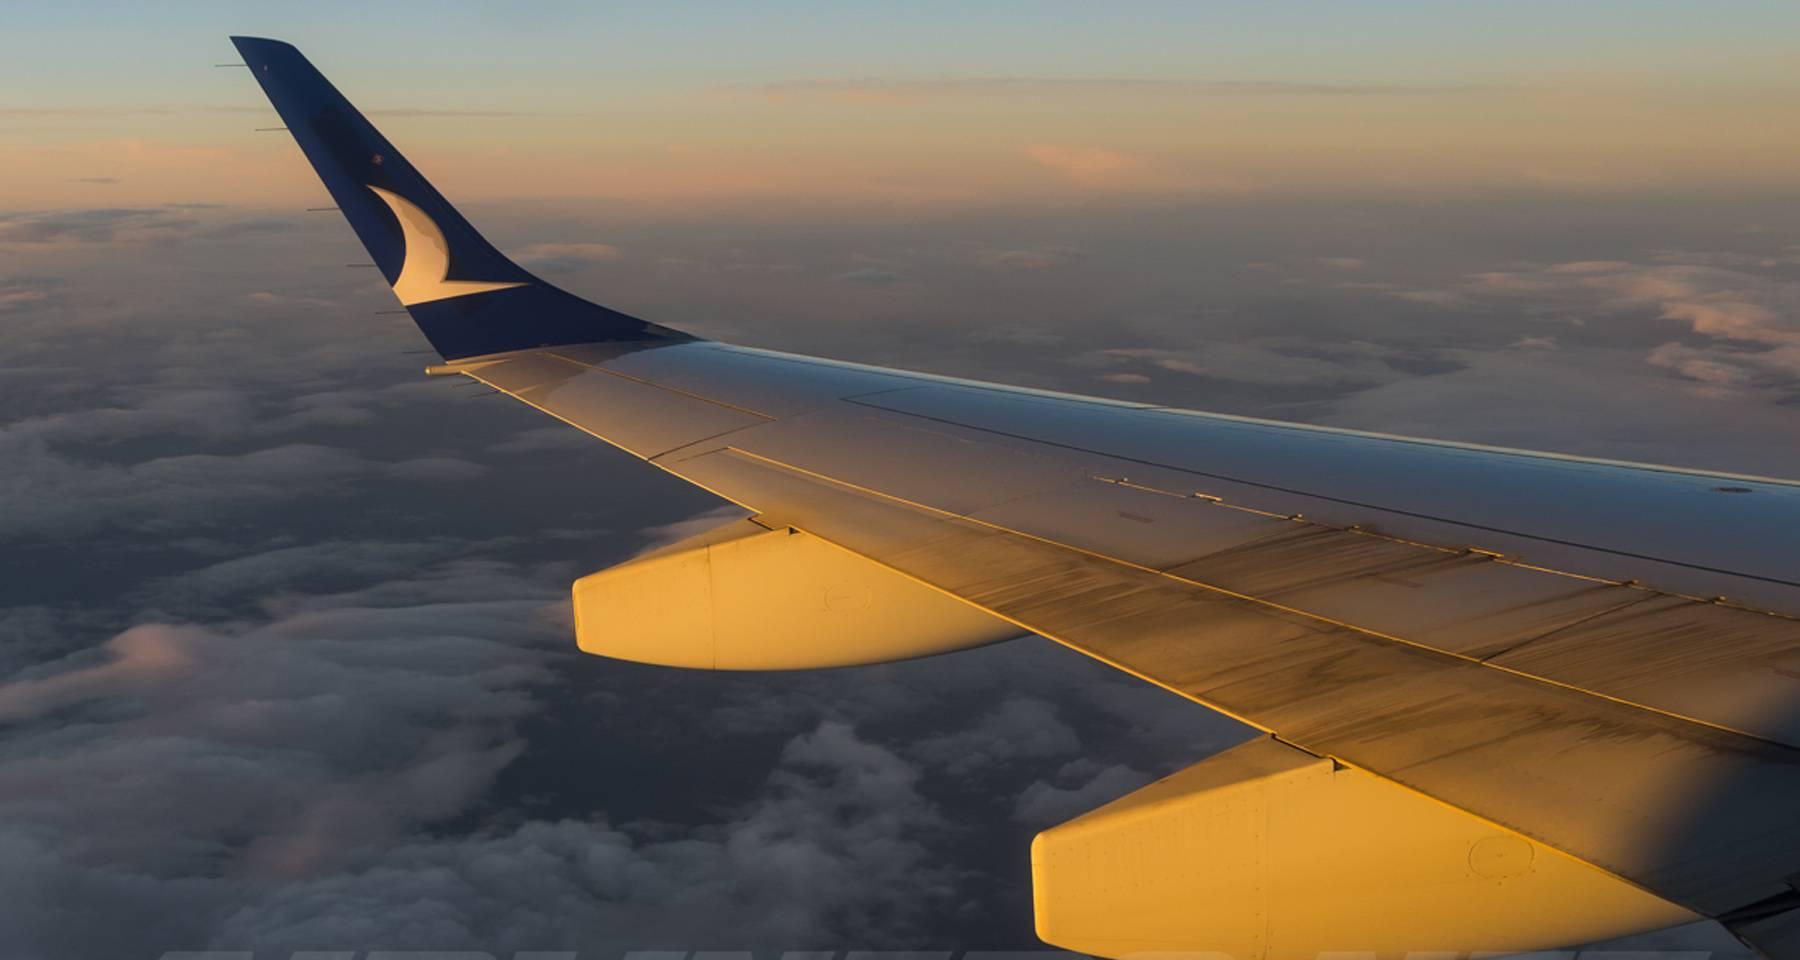 Sivas Anadolu Jet İletişim